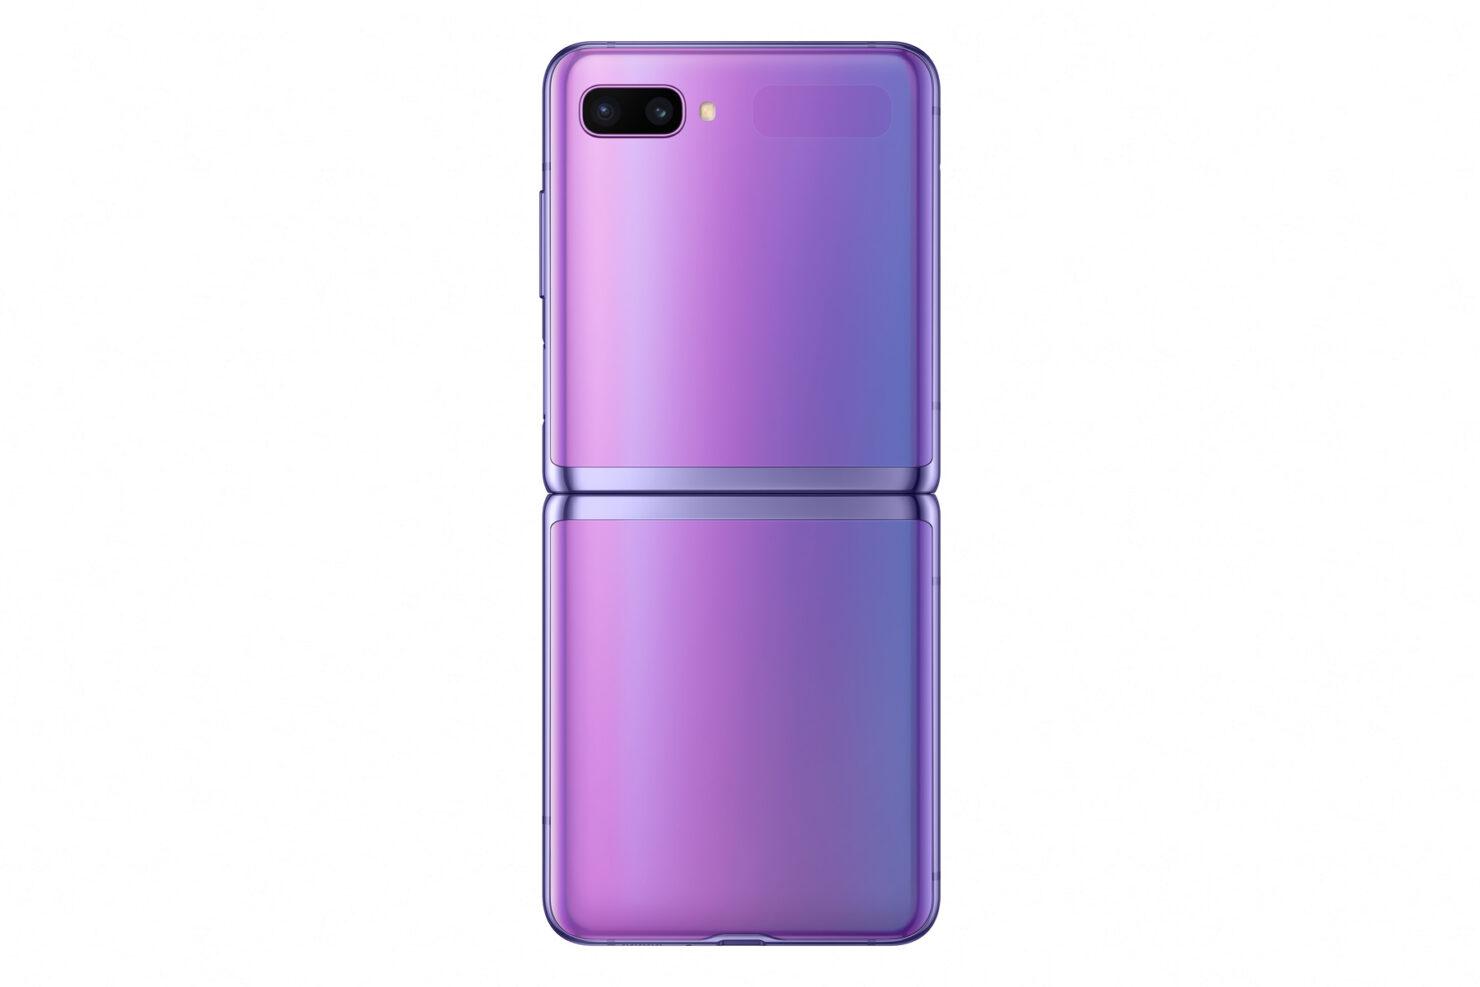 006_galaxyzflip_mirror_purple_unfolded_back